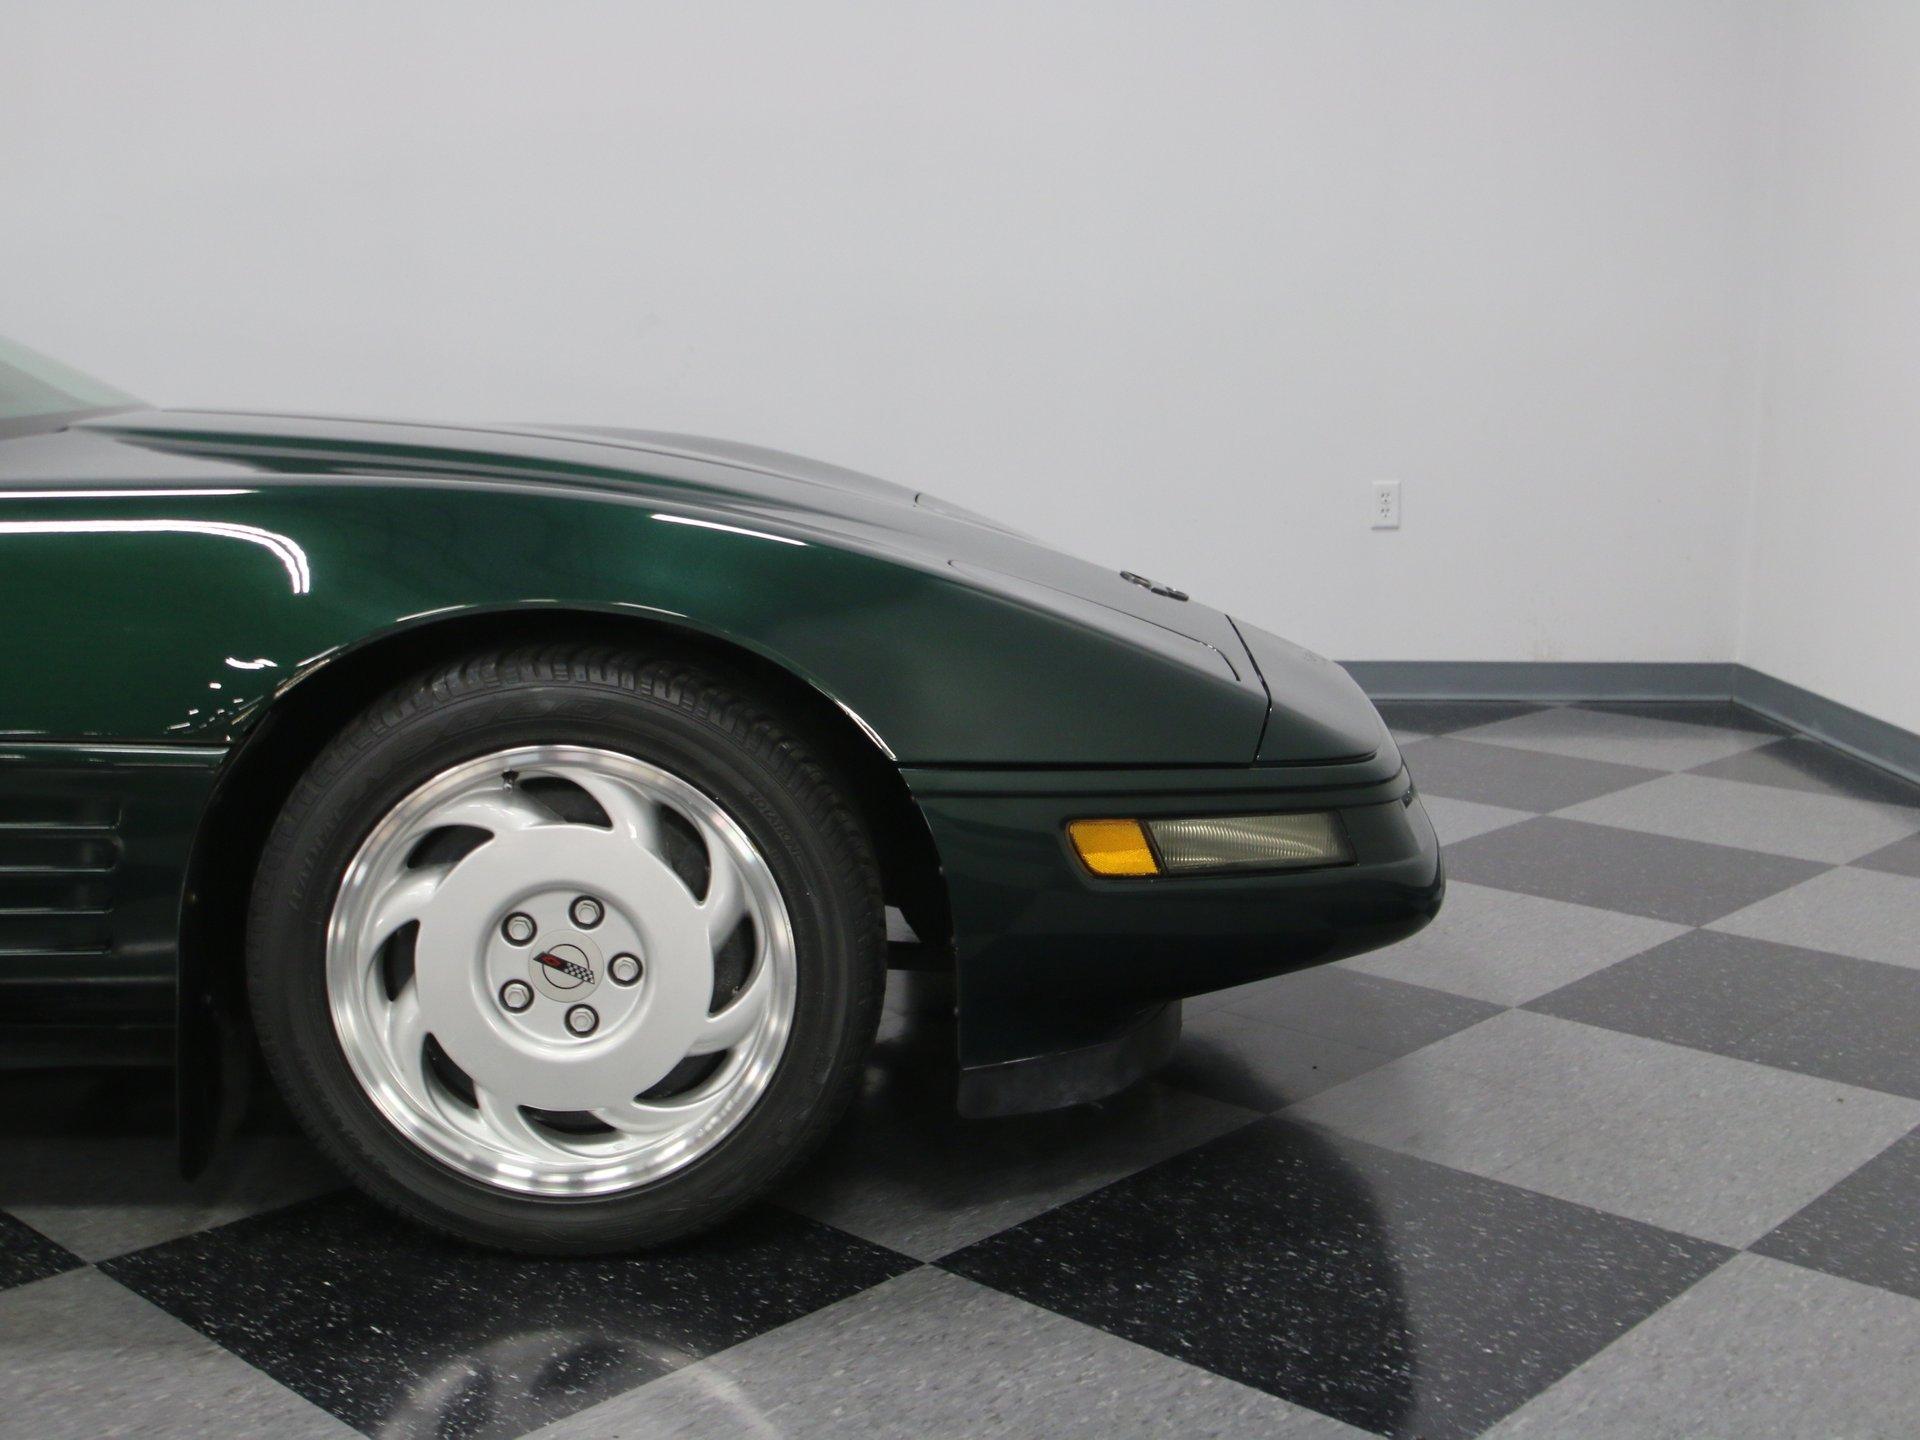 1992 Chevrolet Corvette | Streetside Classics - The Nation's